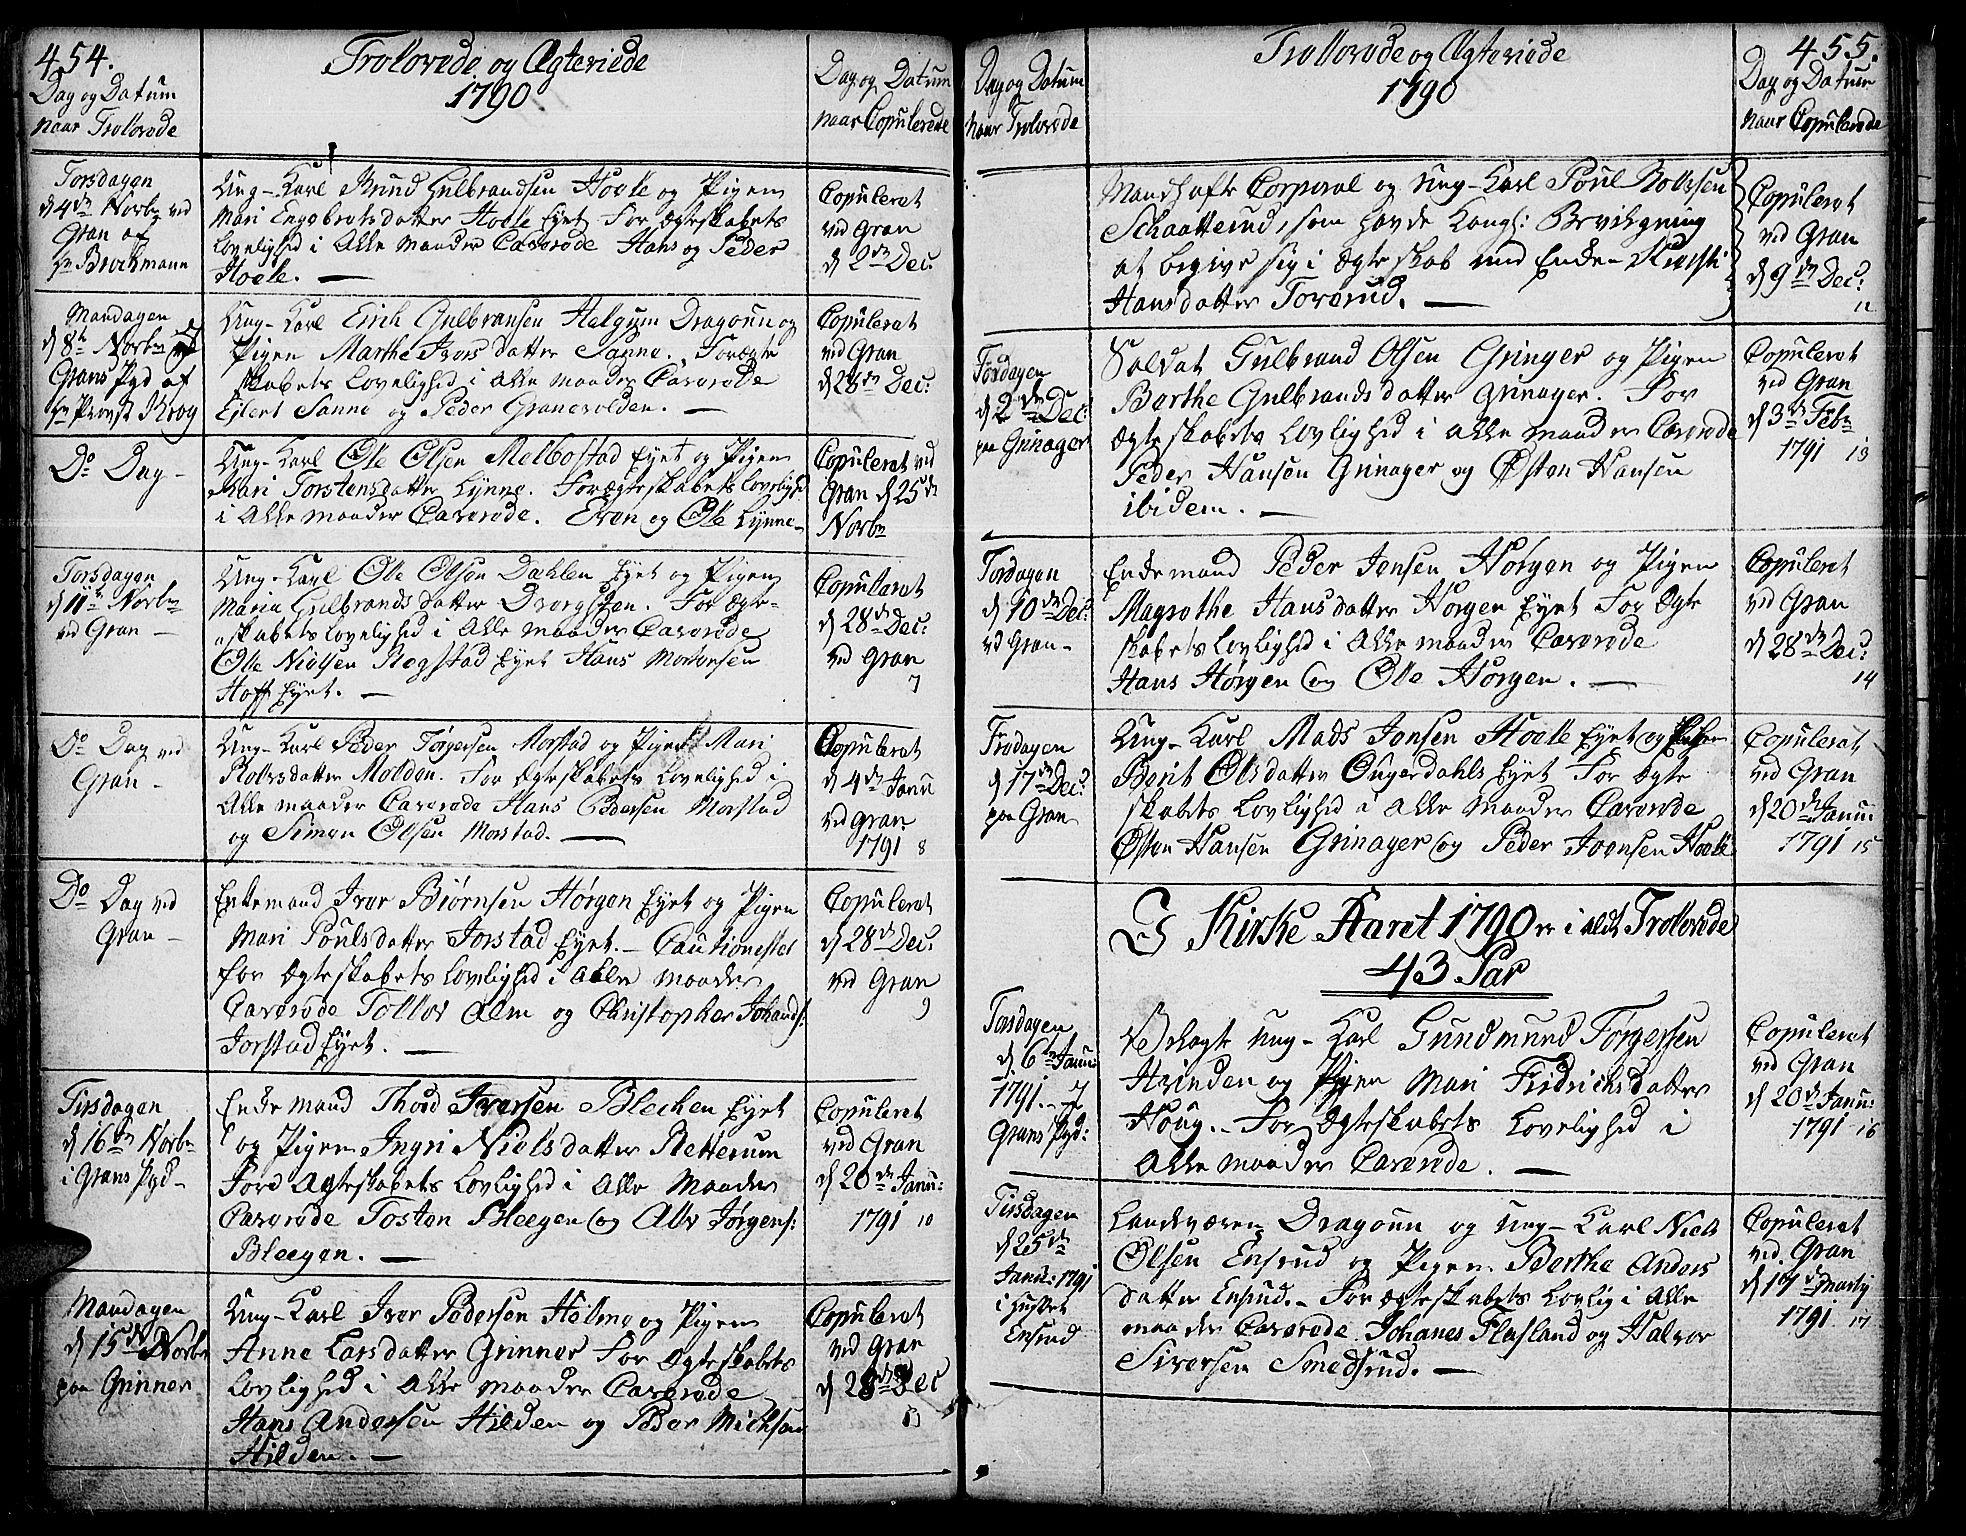 SAH, Gran prestekontor, Ministerialbok nr. 6, 1787-1824, s. 454-455